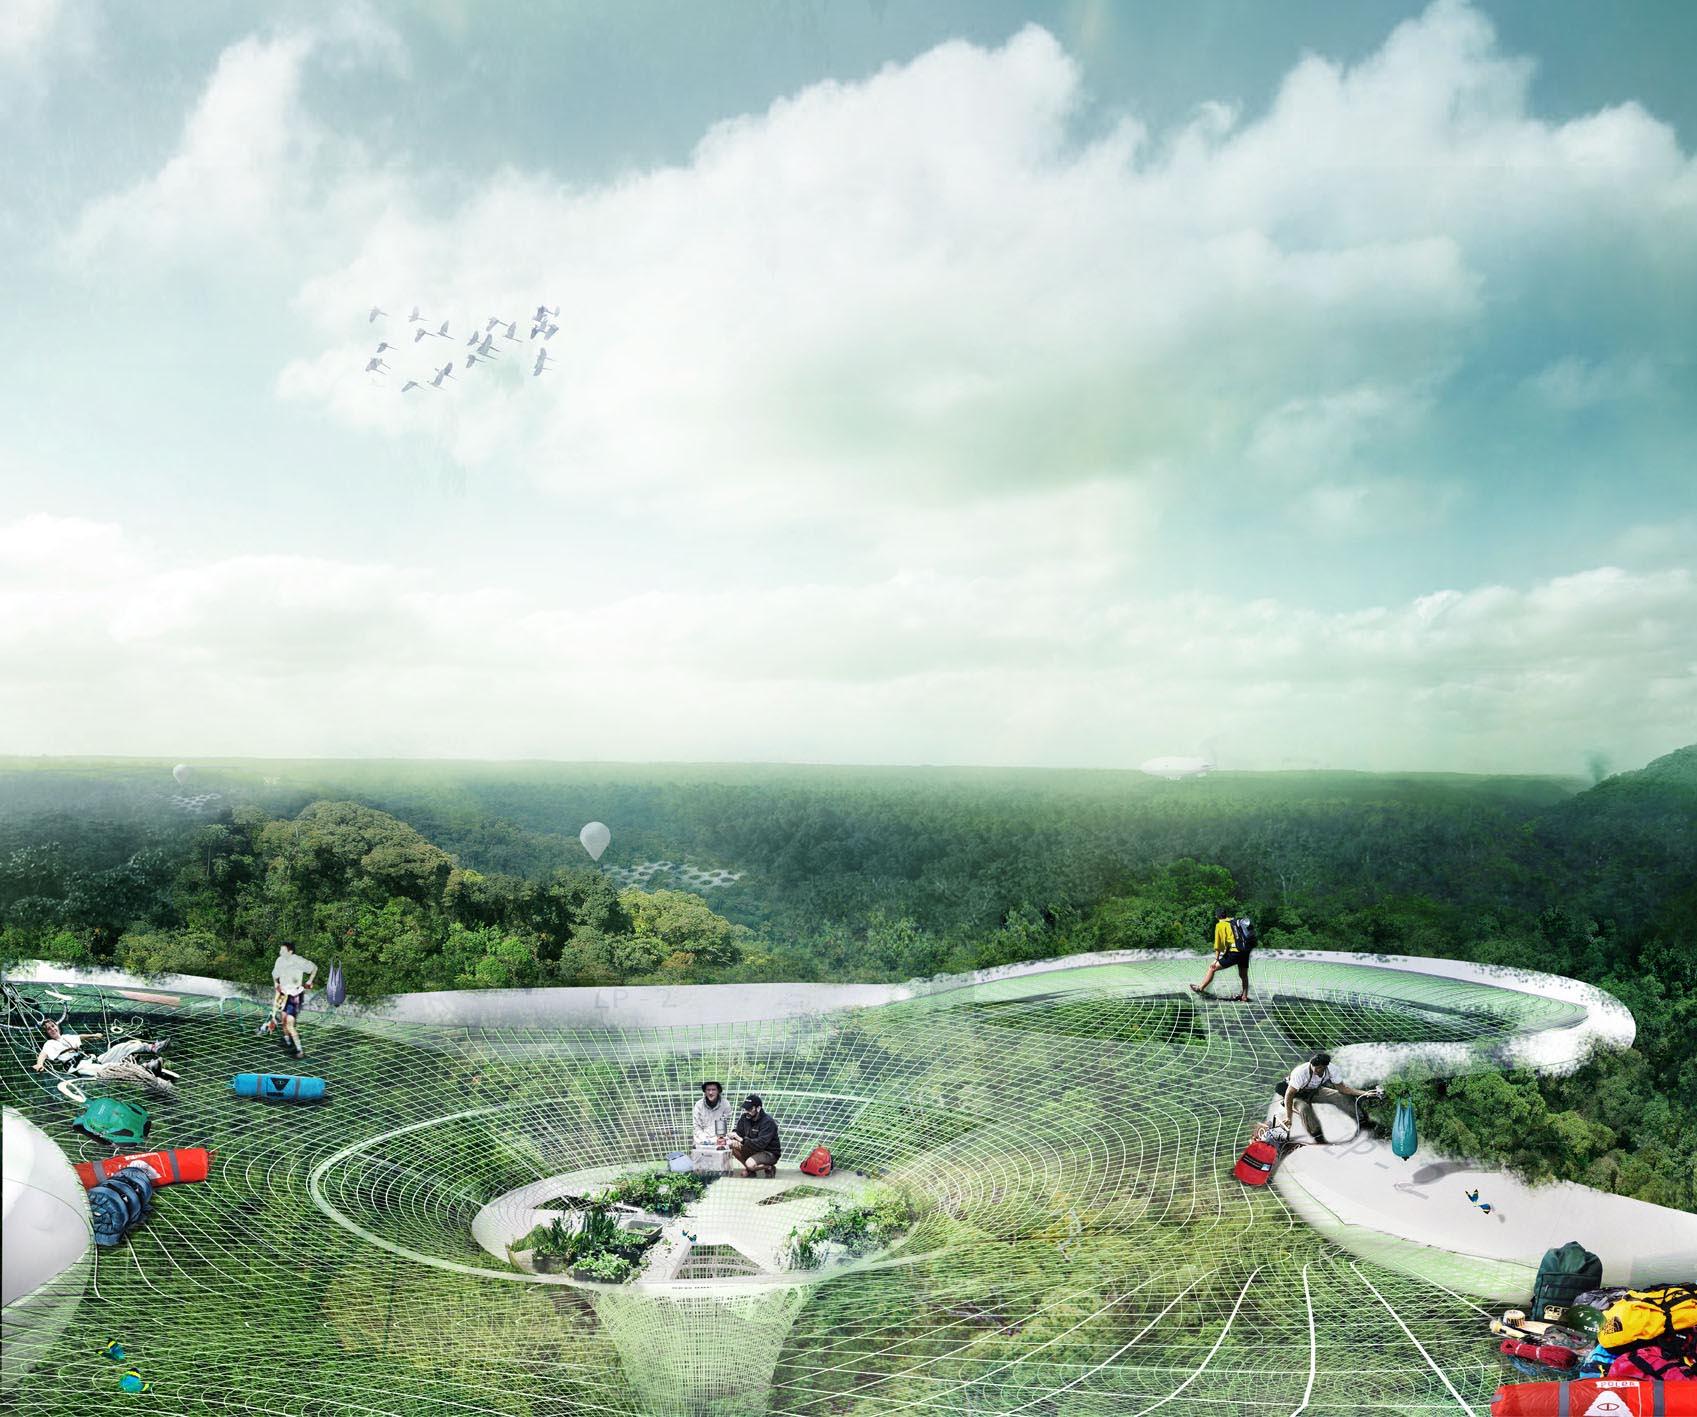 Vencedora do Foster + Partners Prize 2012: Yi Yvonne Weng , © Yi Yvonne Weng